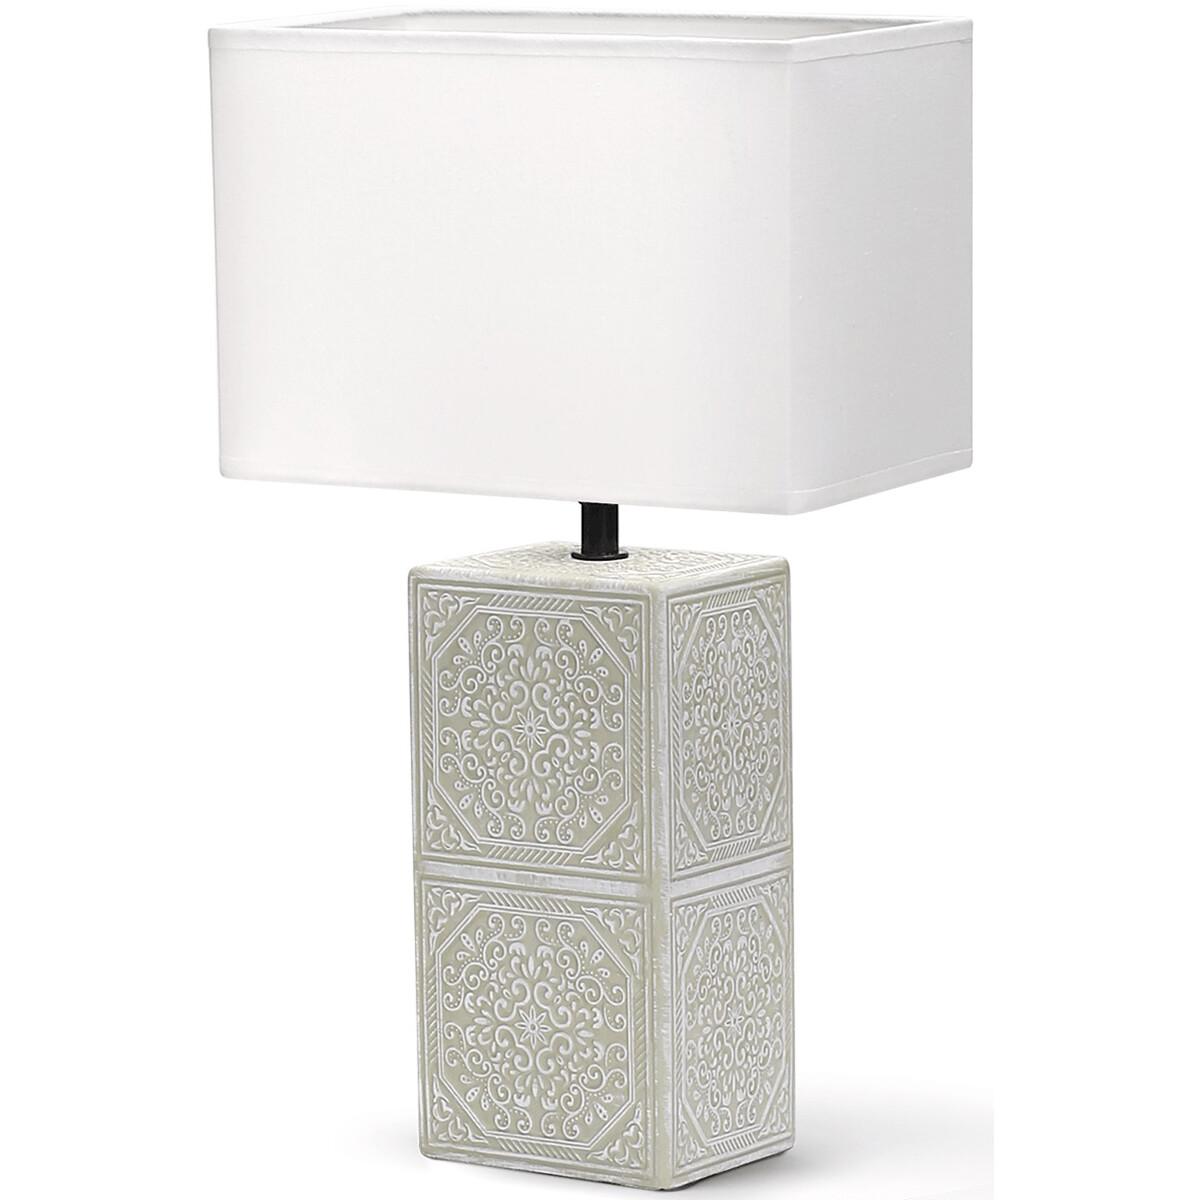 LED Tafellamp - Tafelverlichting - Aigi Astron XL - E14 Fitting - Vierkant - Mat Wit - Keramiek